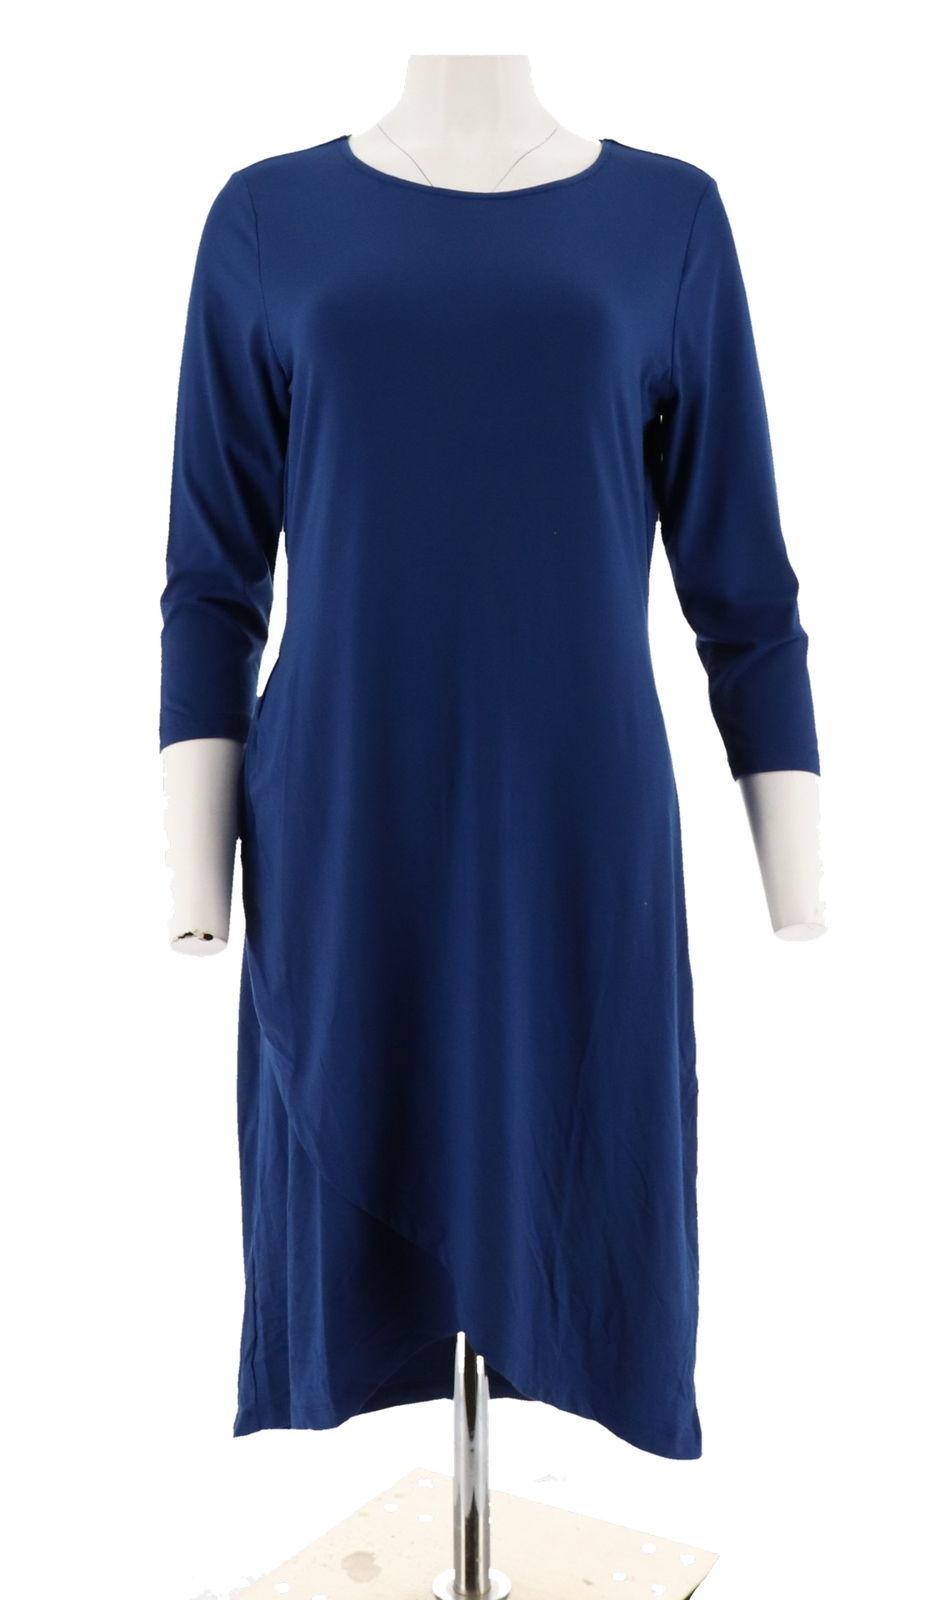 Halston 3/4 Slv Draped Front Crewneck Hi-Low Hem Dress Royal Blue XS NEW A280164